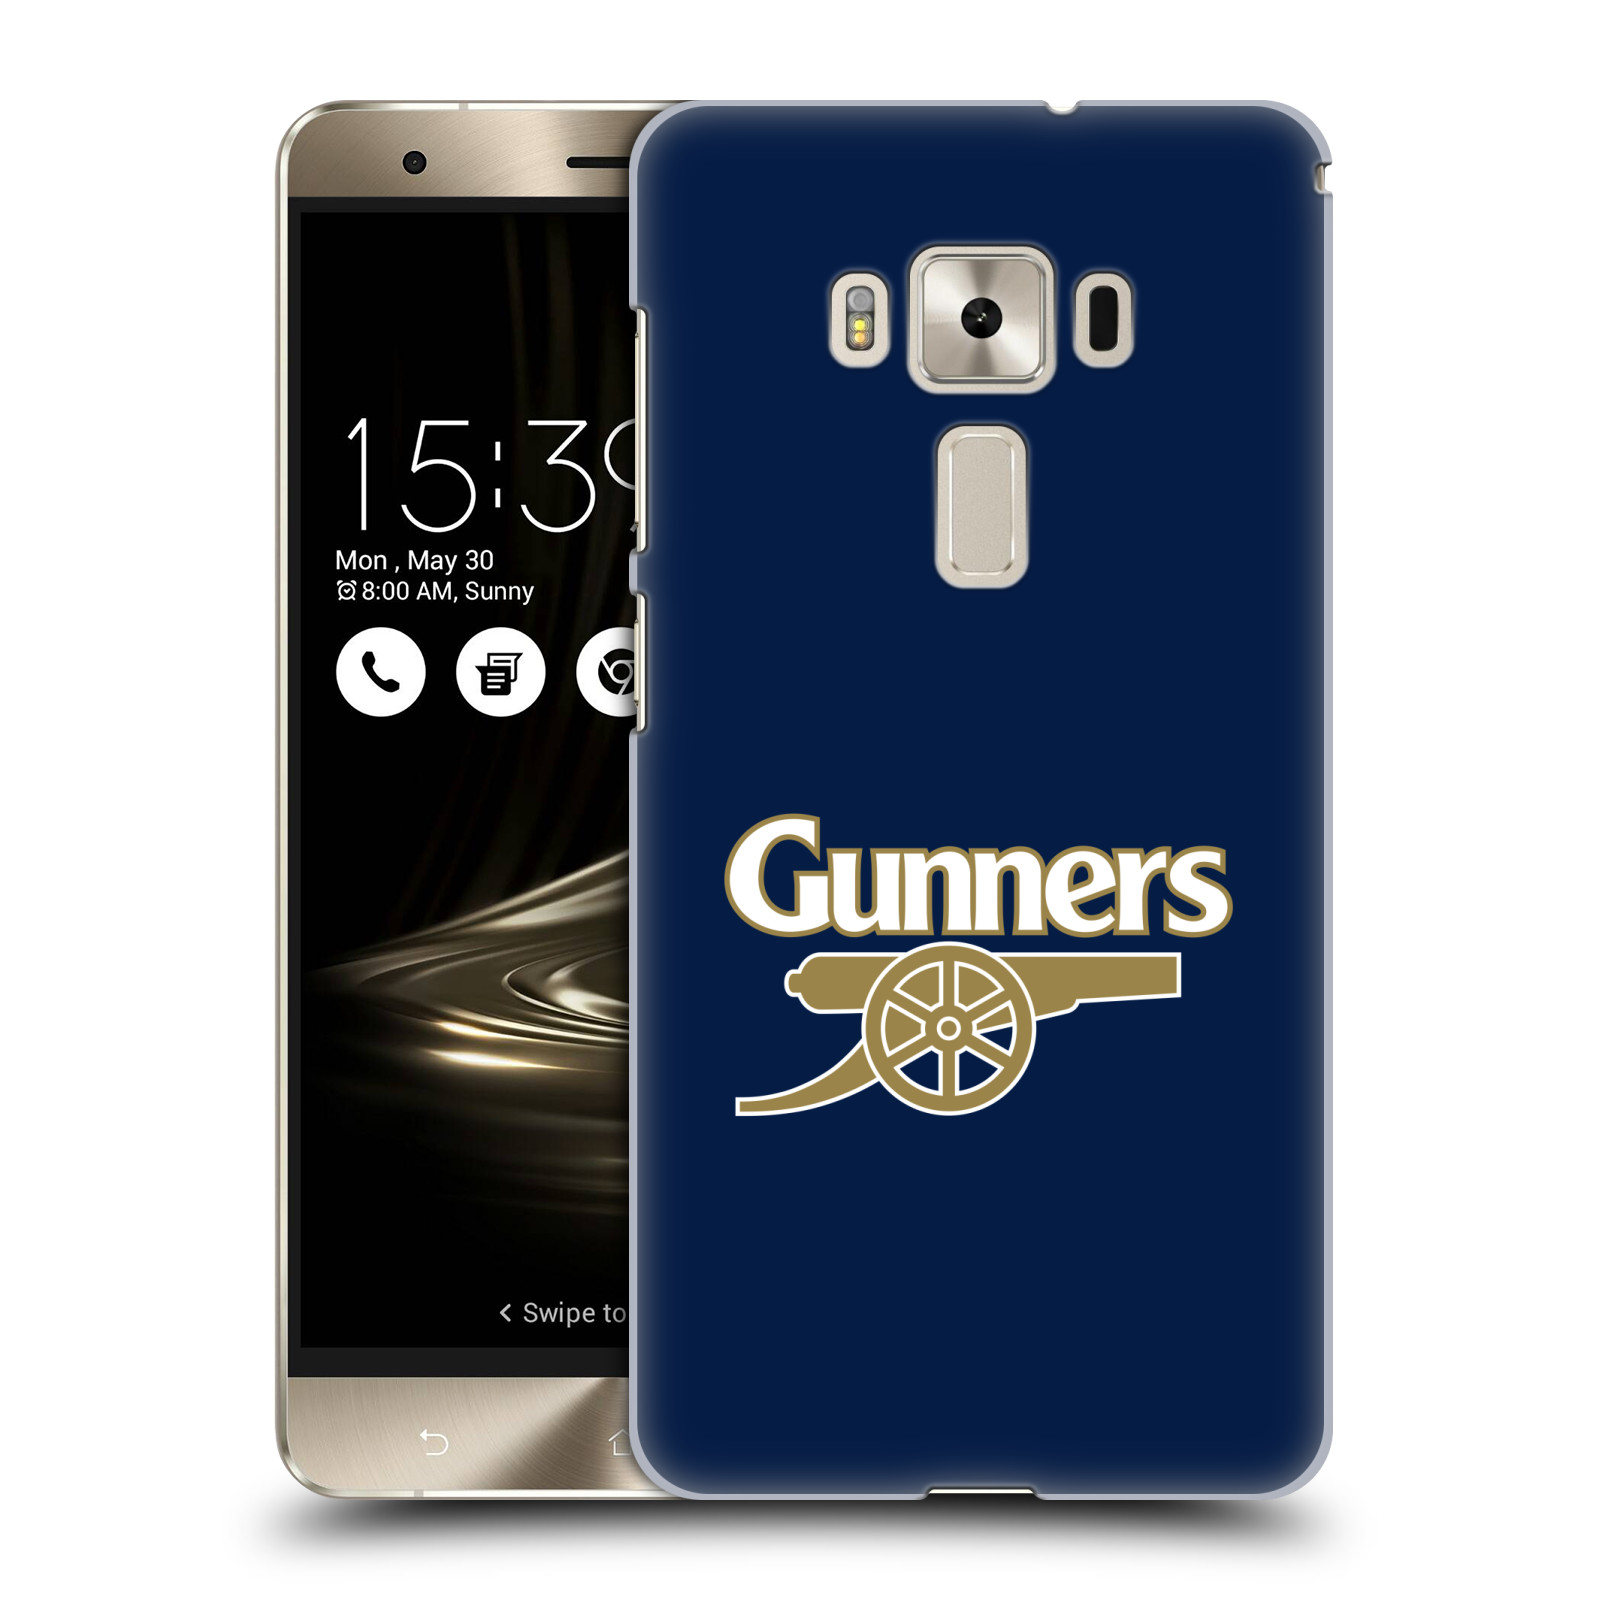 Plastové pouzdro na mobil Asus ZenFone 3 Deluxe ZS570KL - Head Case - Arsenal FC - Gunners